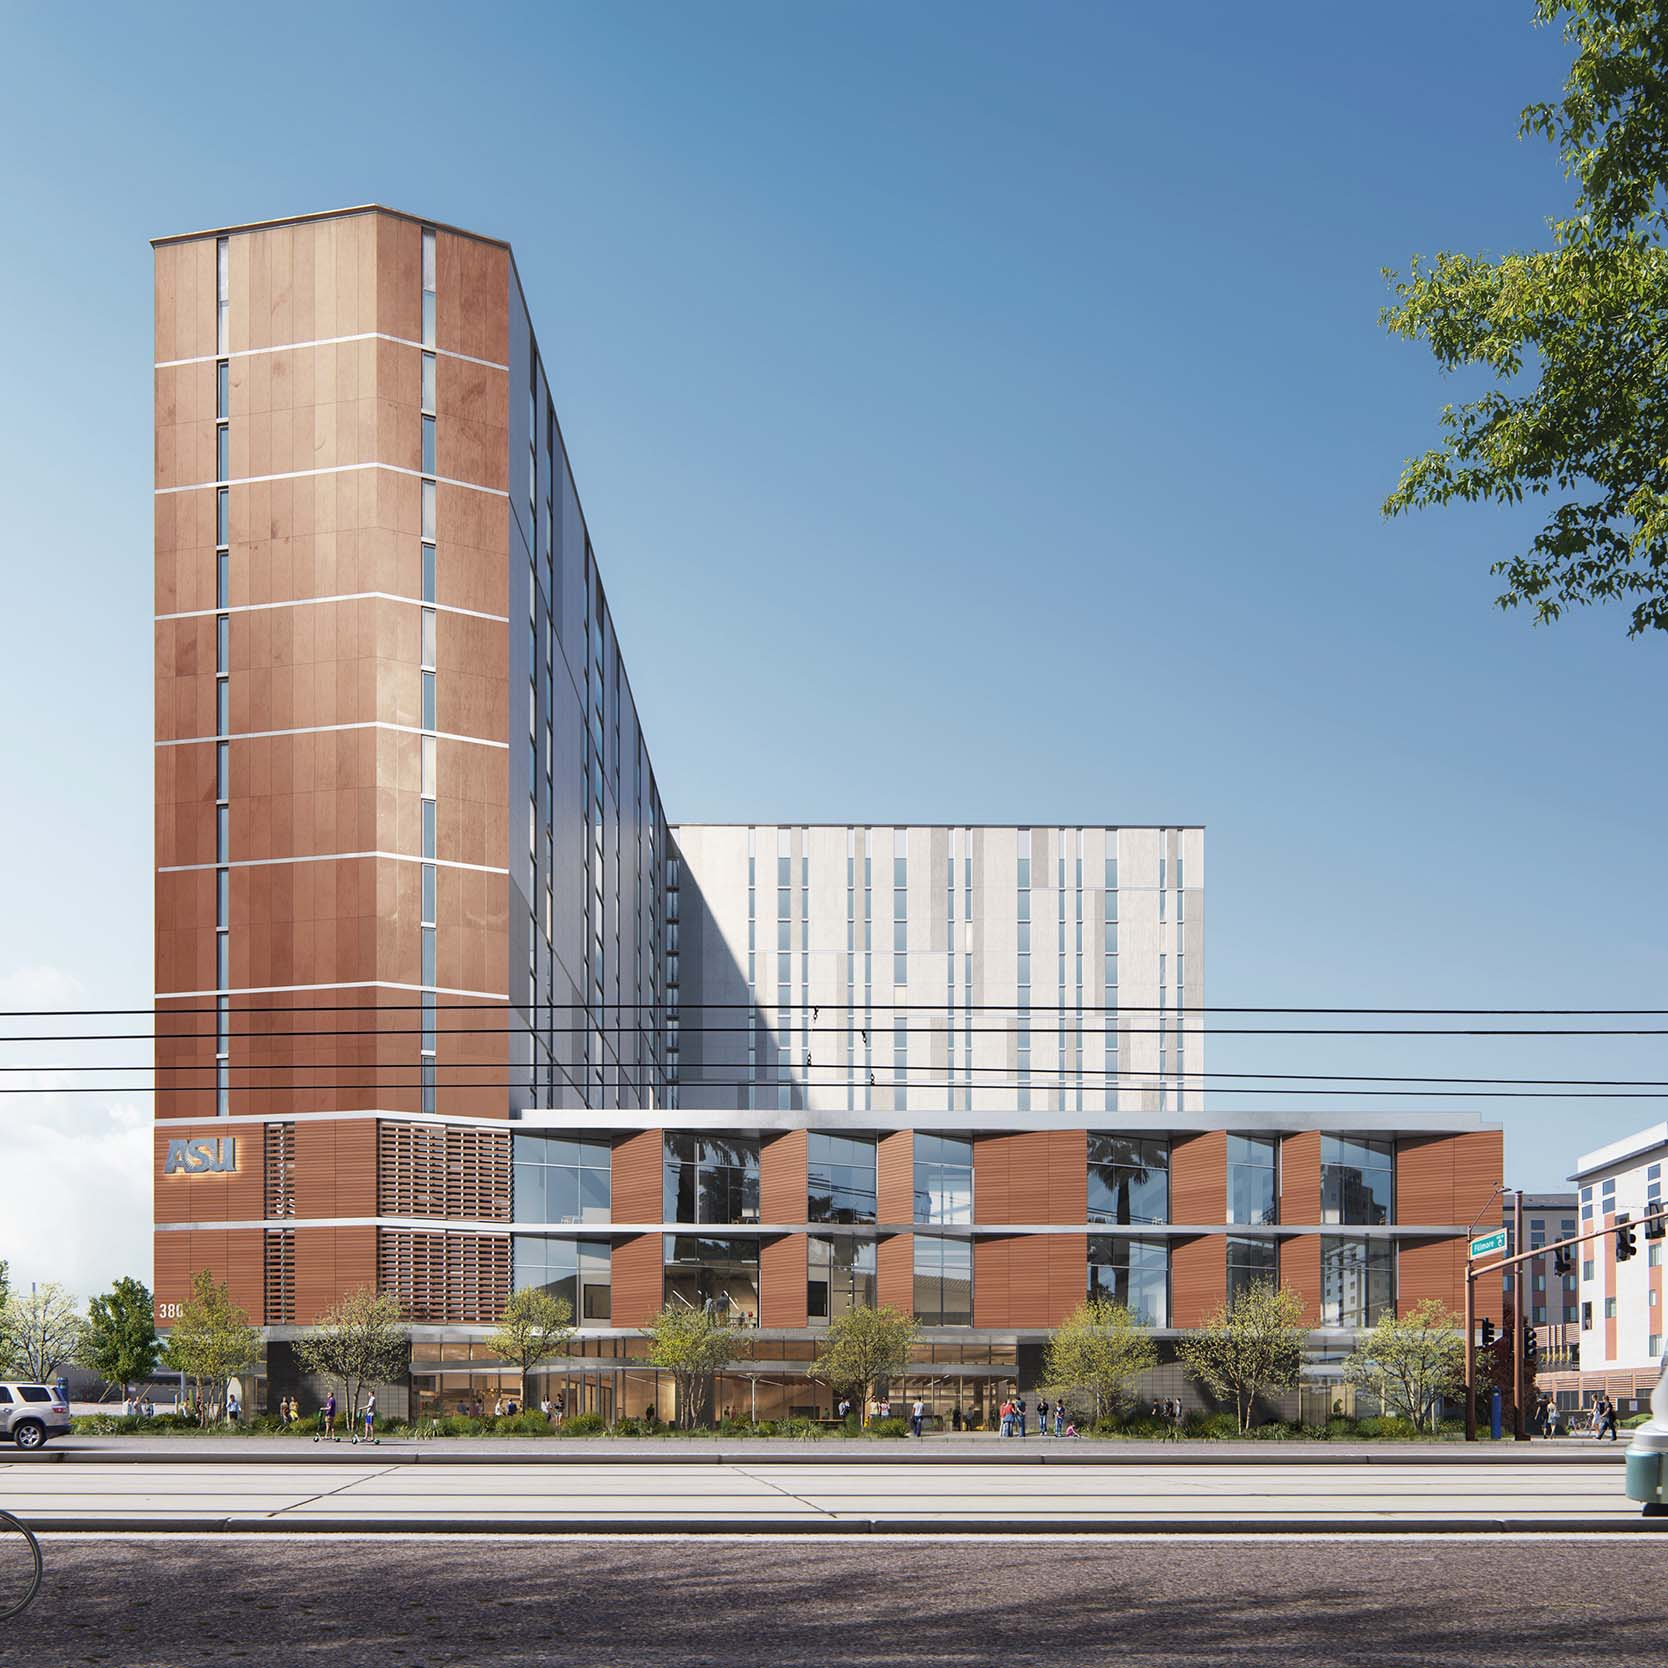 Arizona State's new residence tower